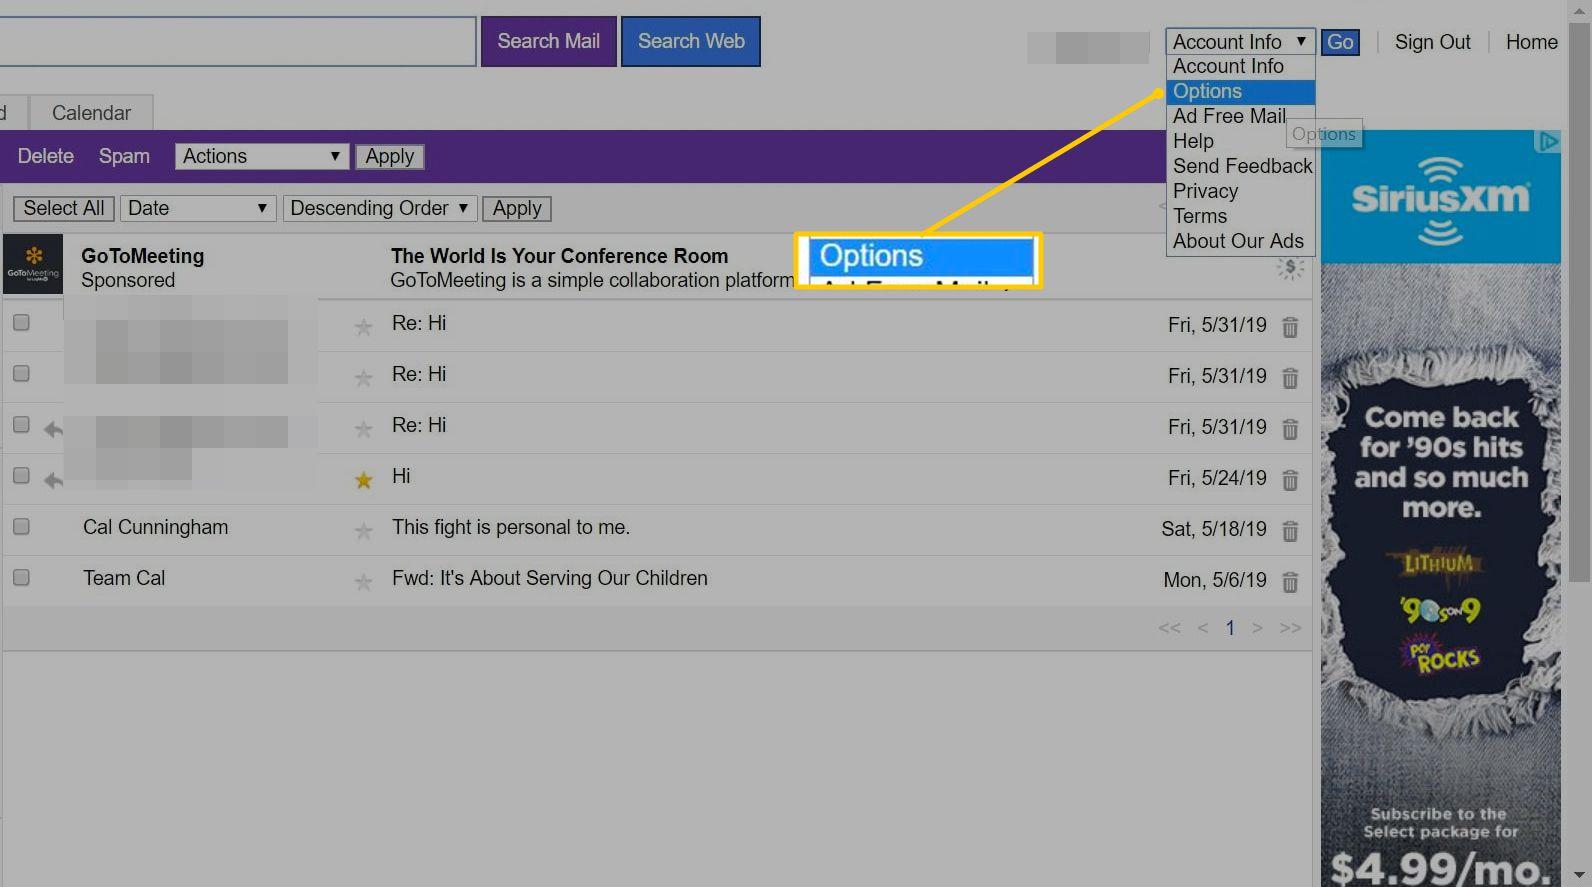 Options in Account Info menu